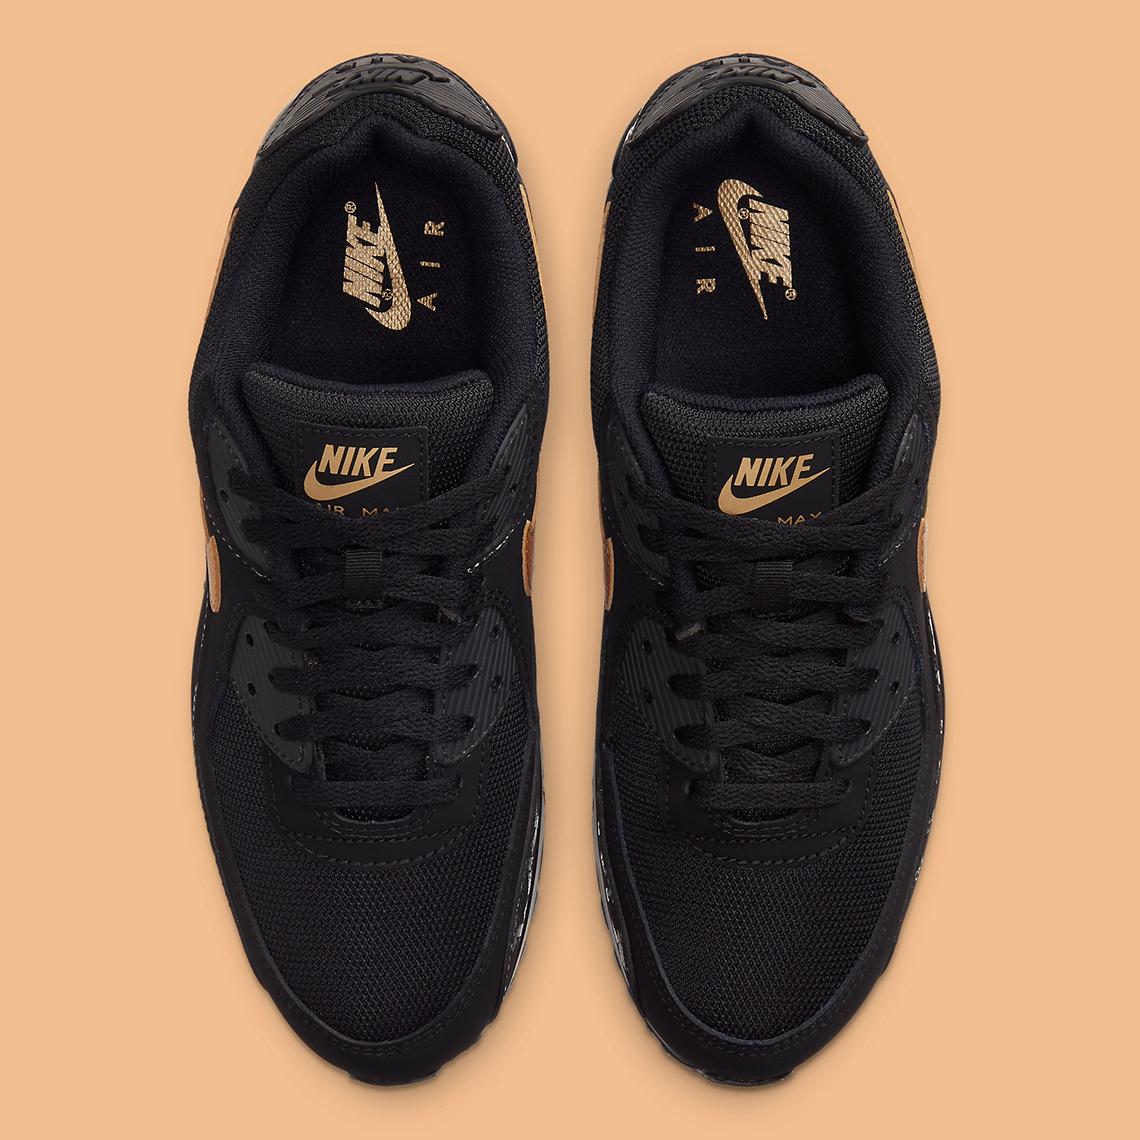 Nike Air Max 90 Black Gold DC4119-001 | SneakerNews.com